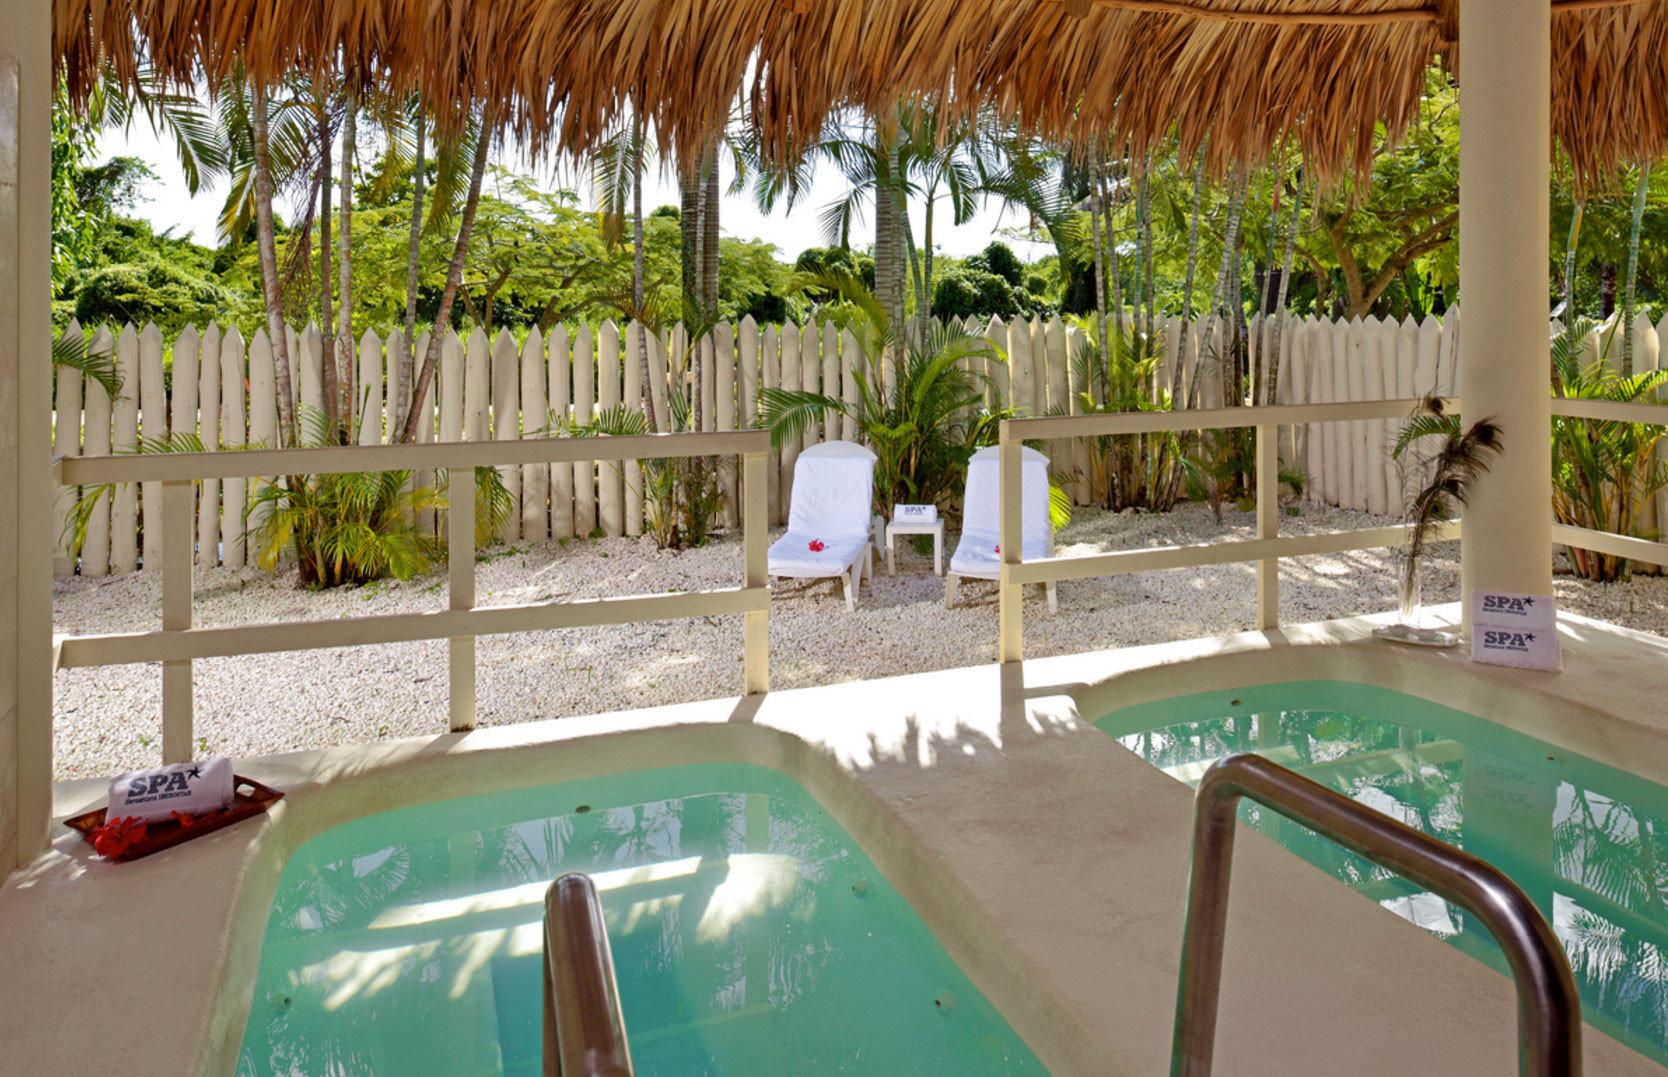 green swimming pool leisure property Resort backyard Villa hacienda